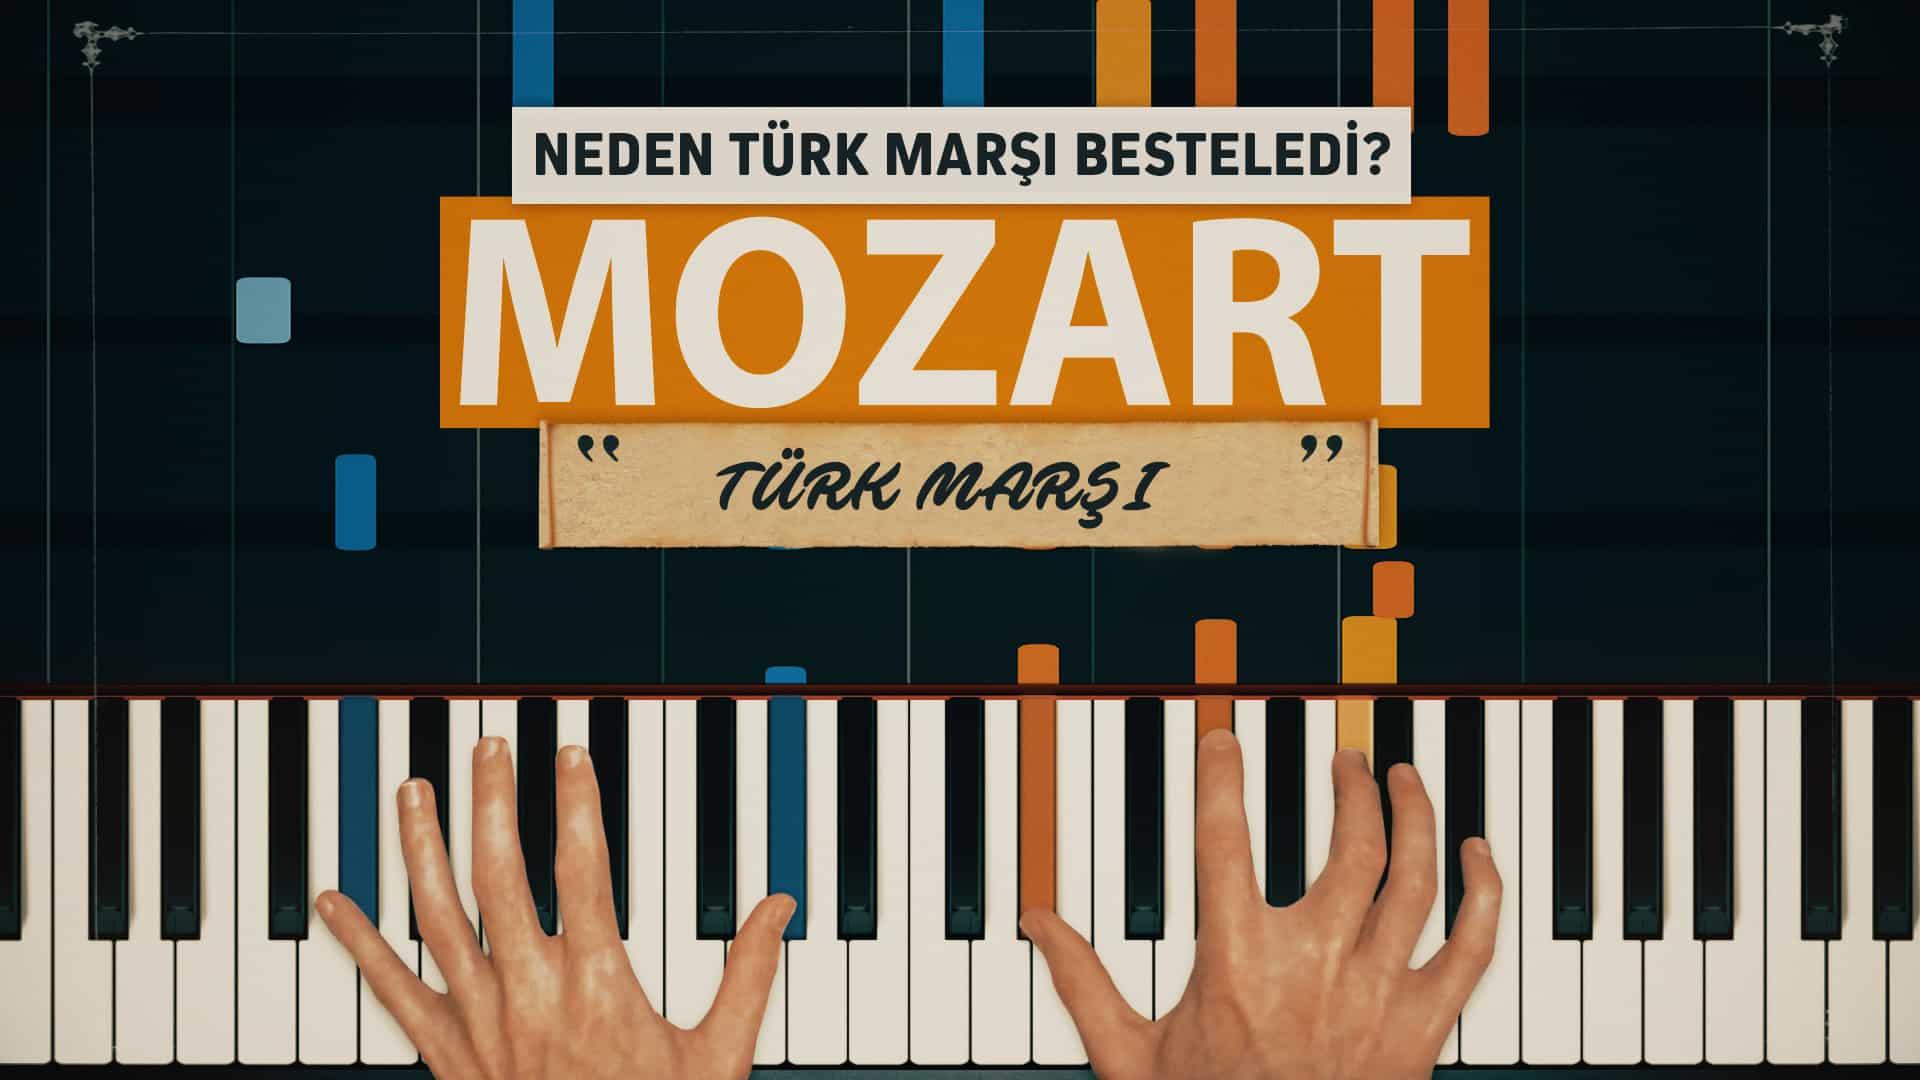 mozart-neden-turk-marsi-besteledi-